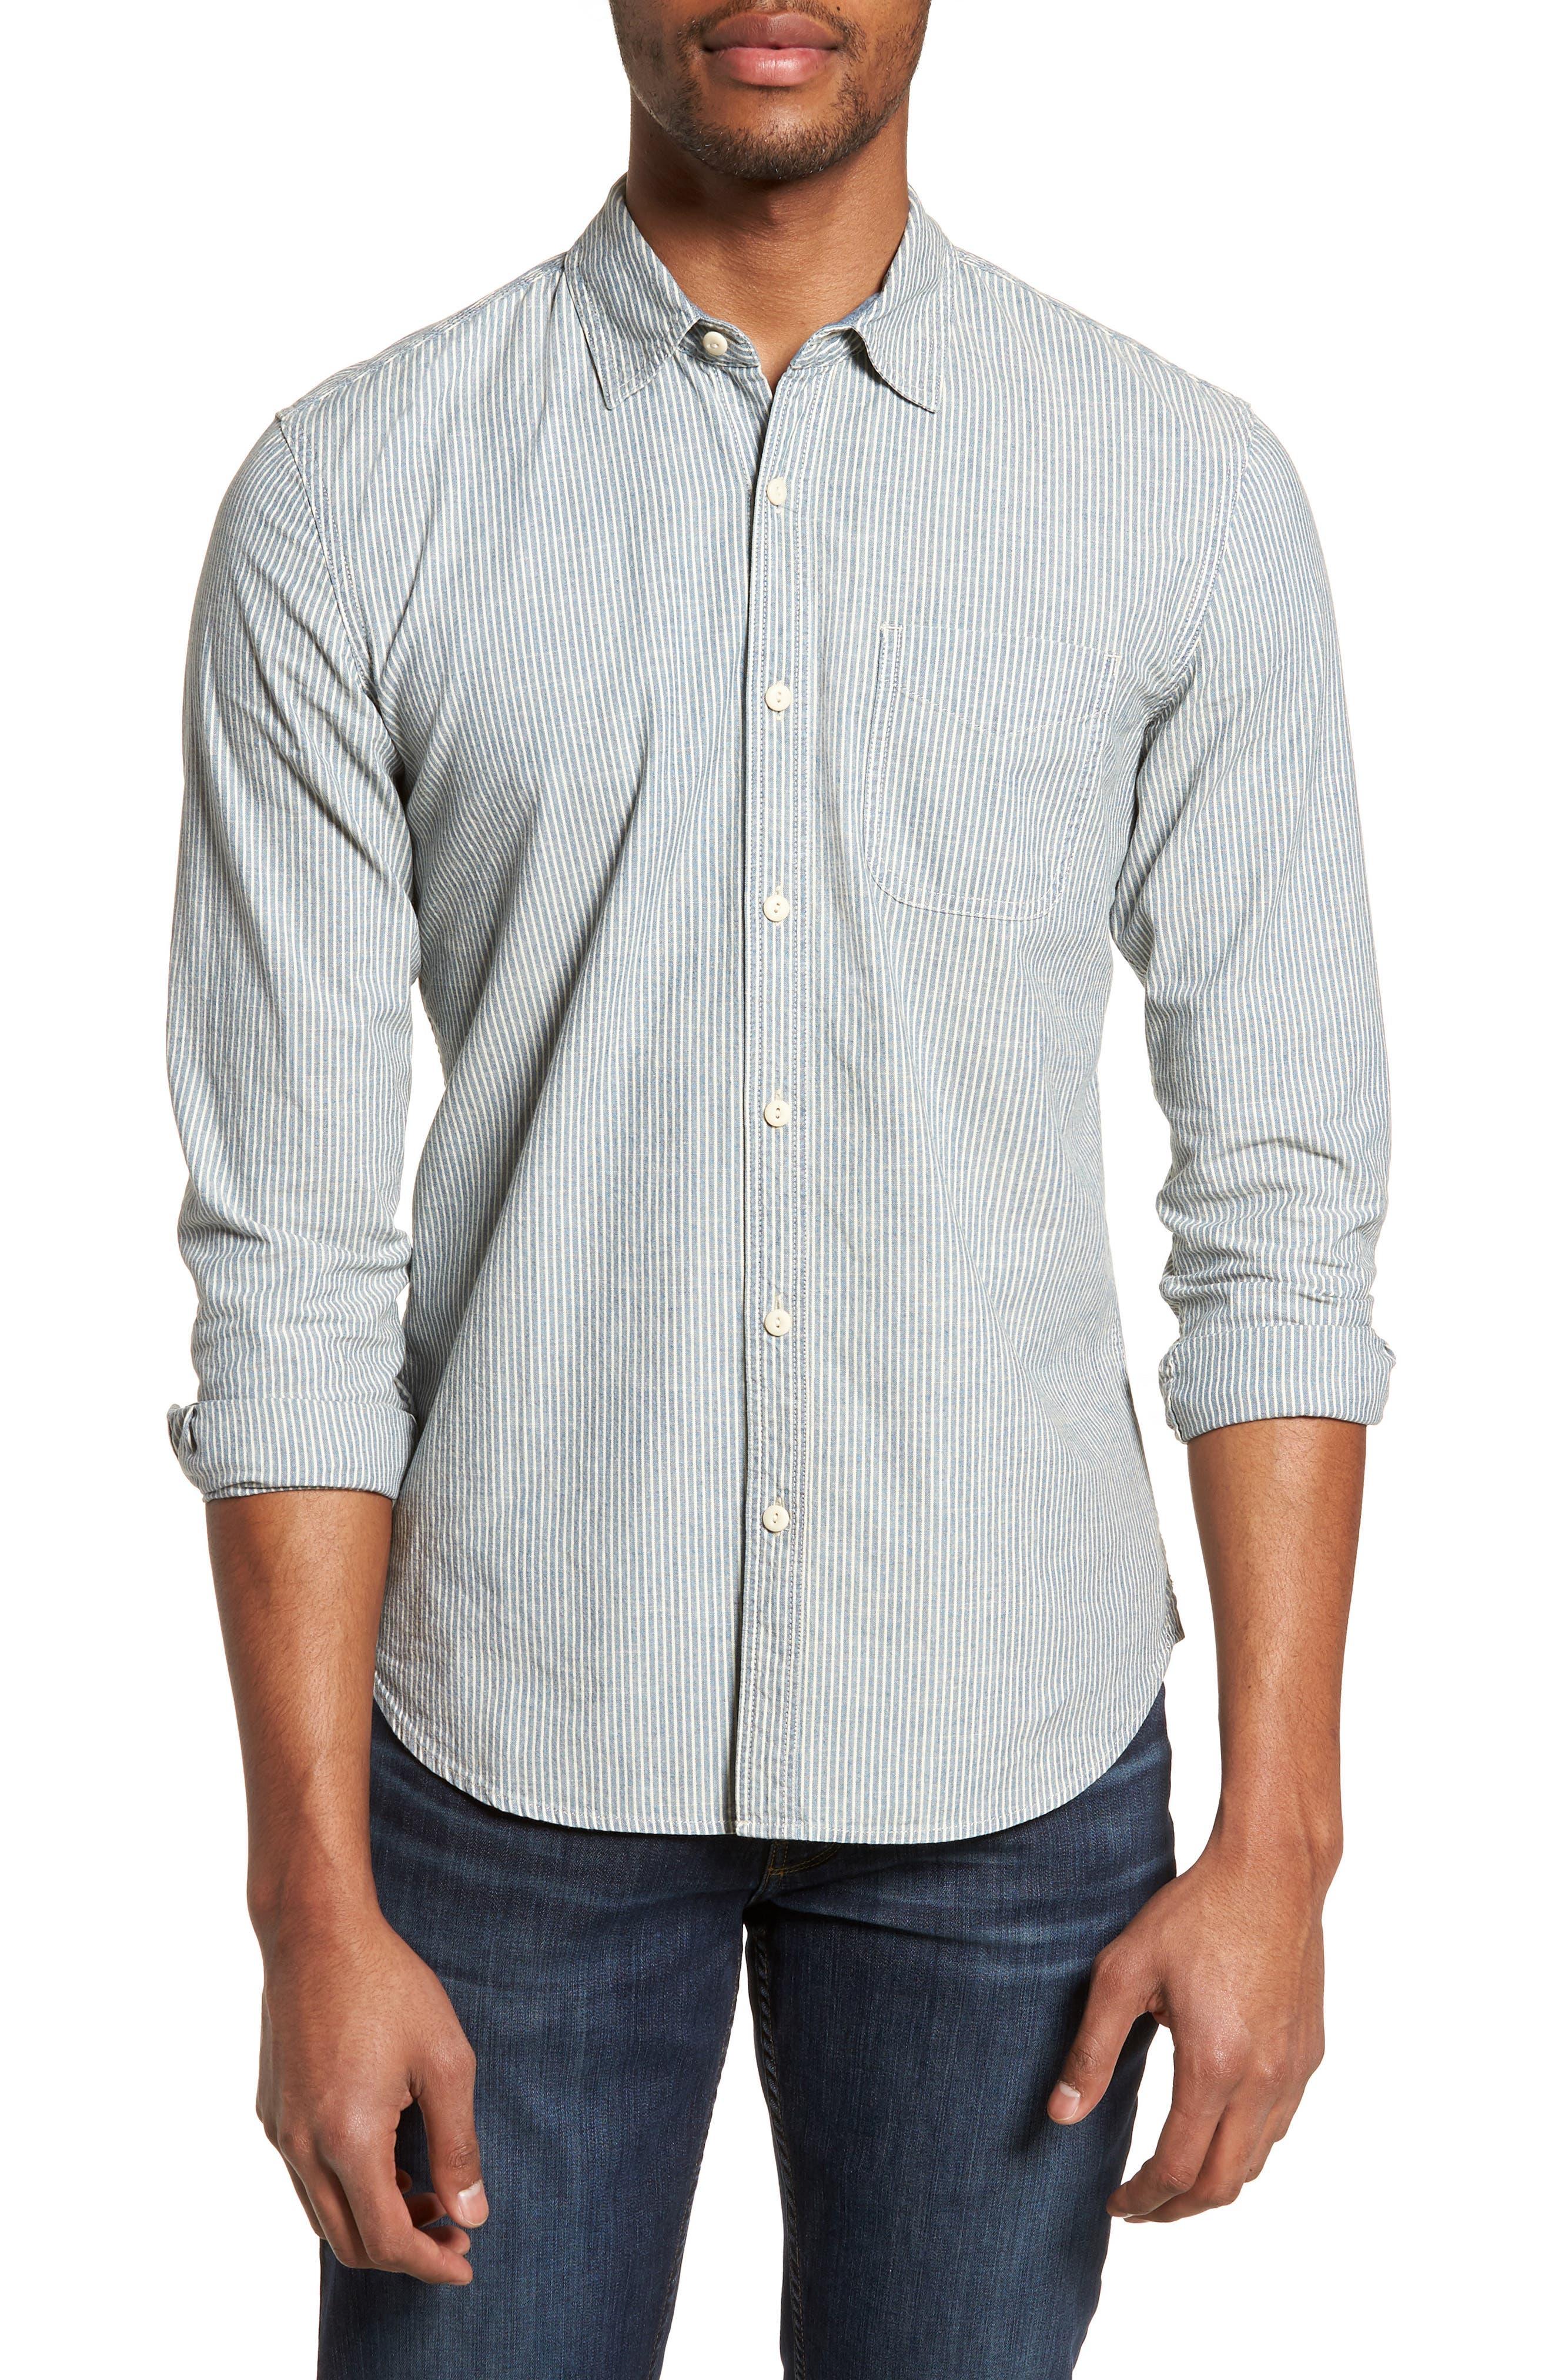 Nelson Slim Fit Stripe Sport Shirt,                             Main thumbnail 1, color,                             Indigo/ White Stripe